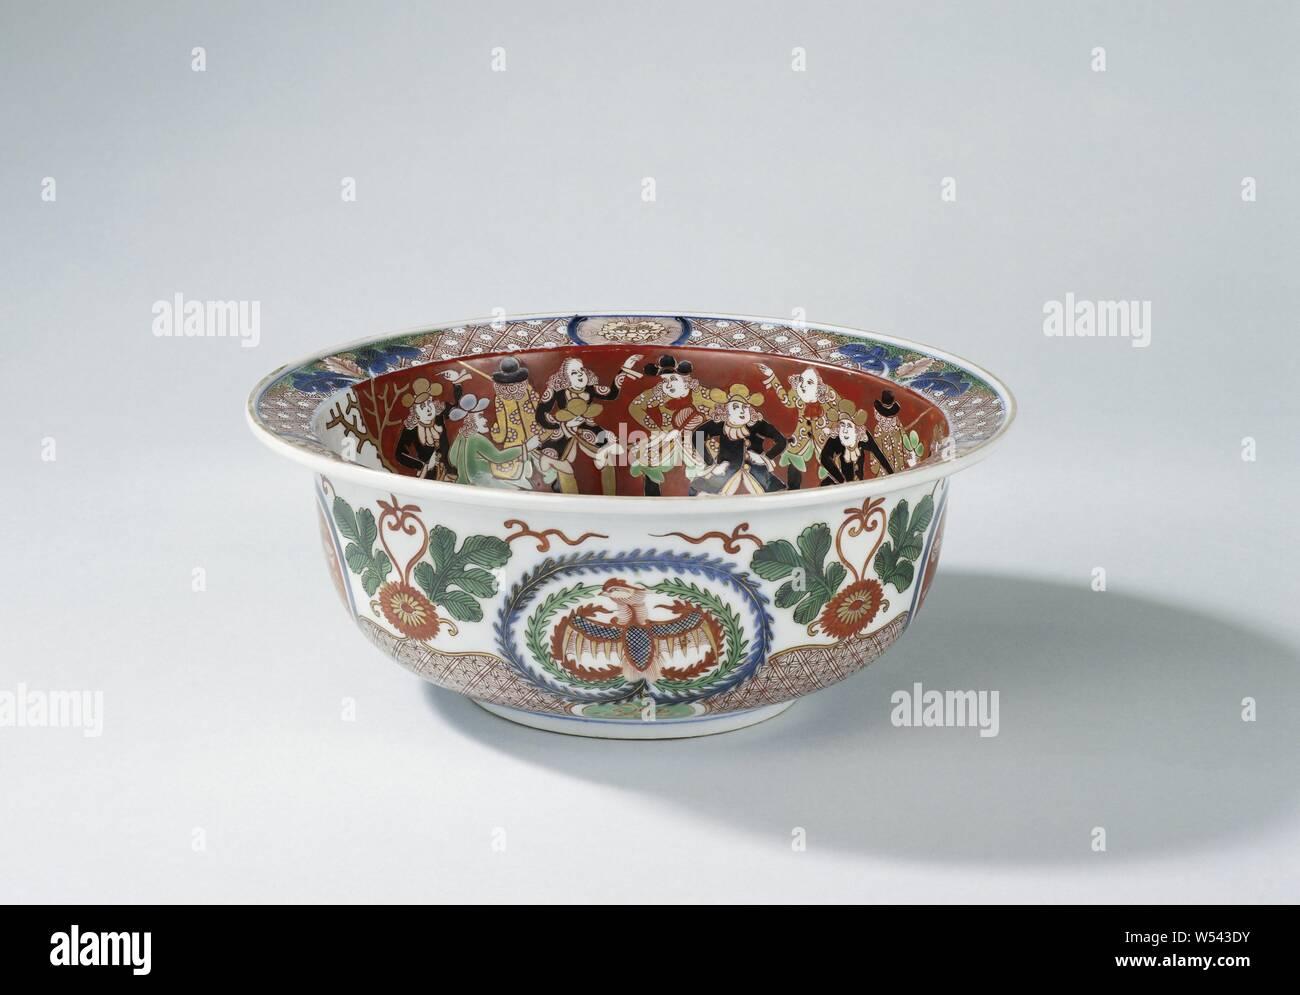 Set of 3 White Enamel Mixing Bowls Set Vintage Retro French Logo Styled Pots New